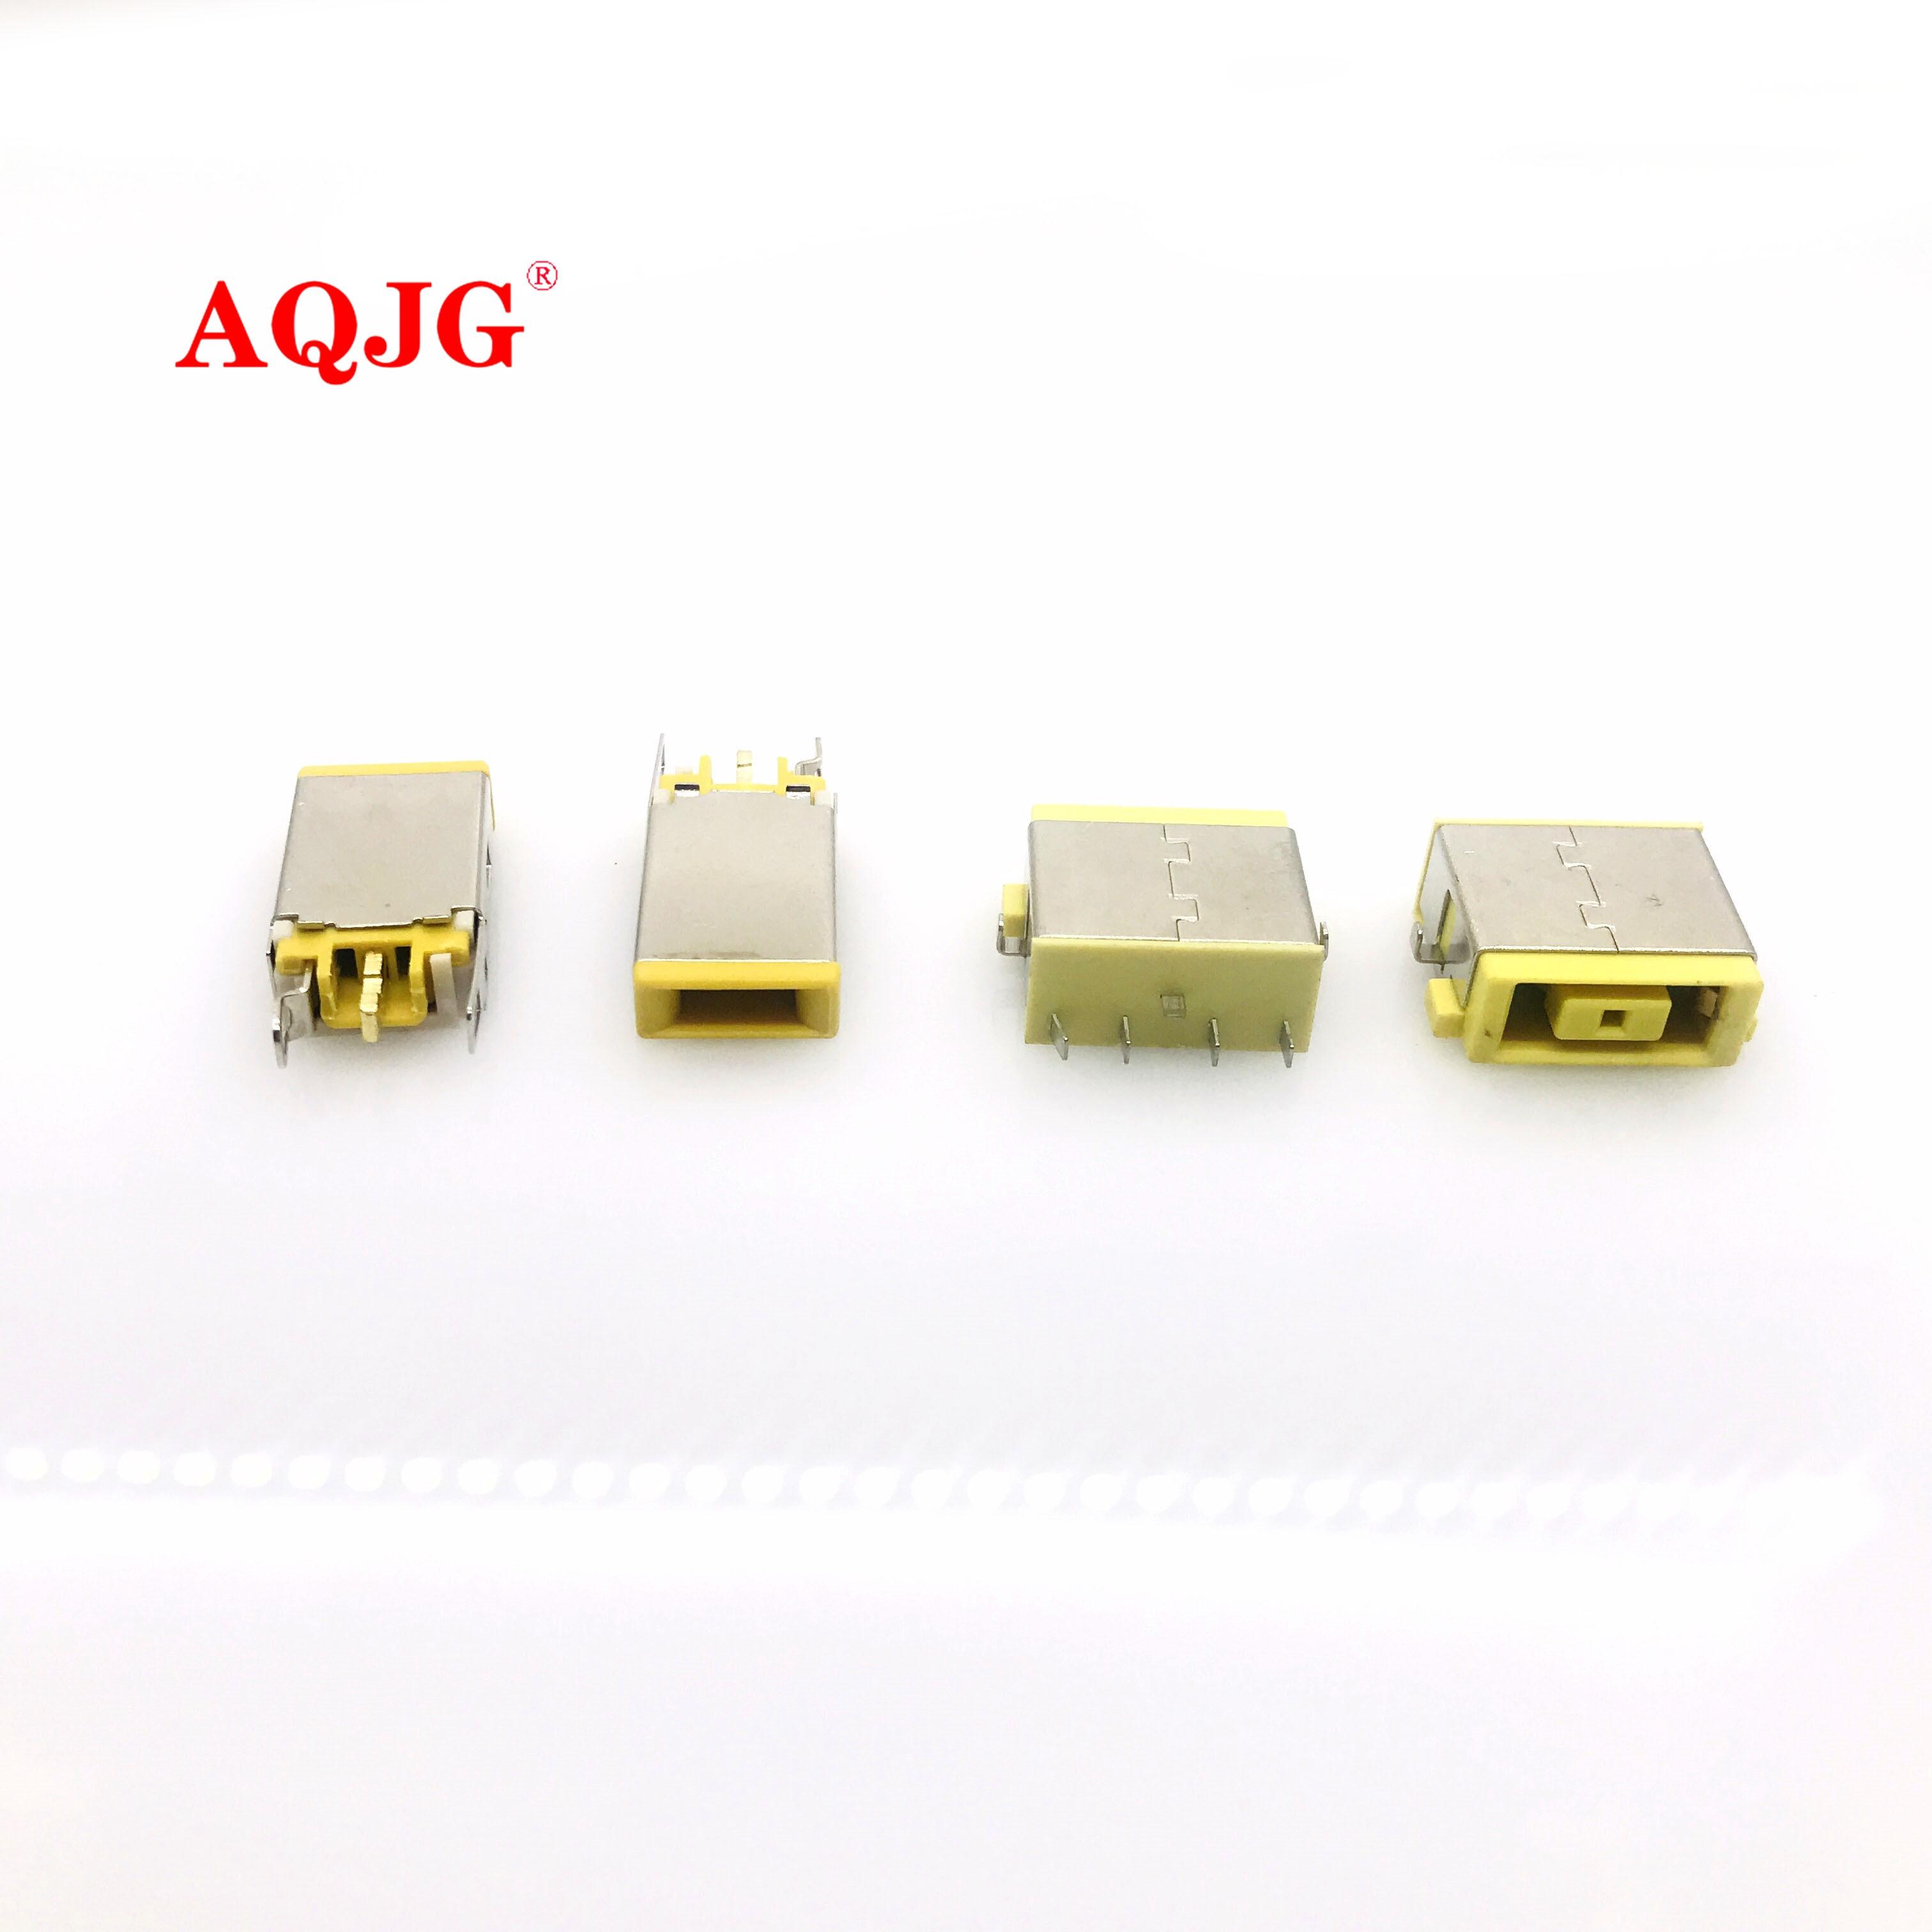 Original New DC Jack FOR IBM Lenovo YOGA 11 11S 13 X1 Carbon Square Head Power Plug Connector Socket Charging Port